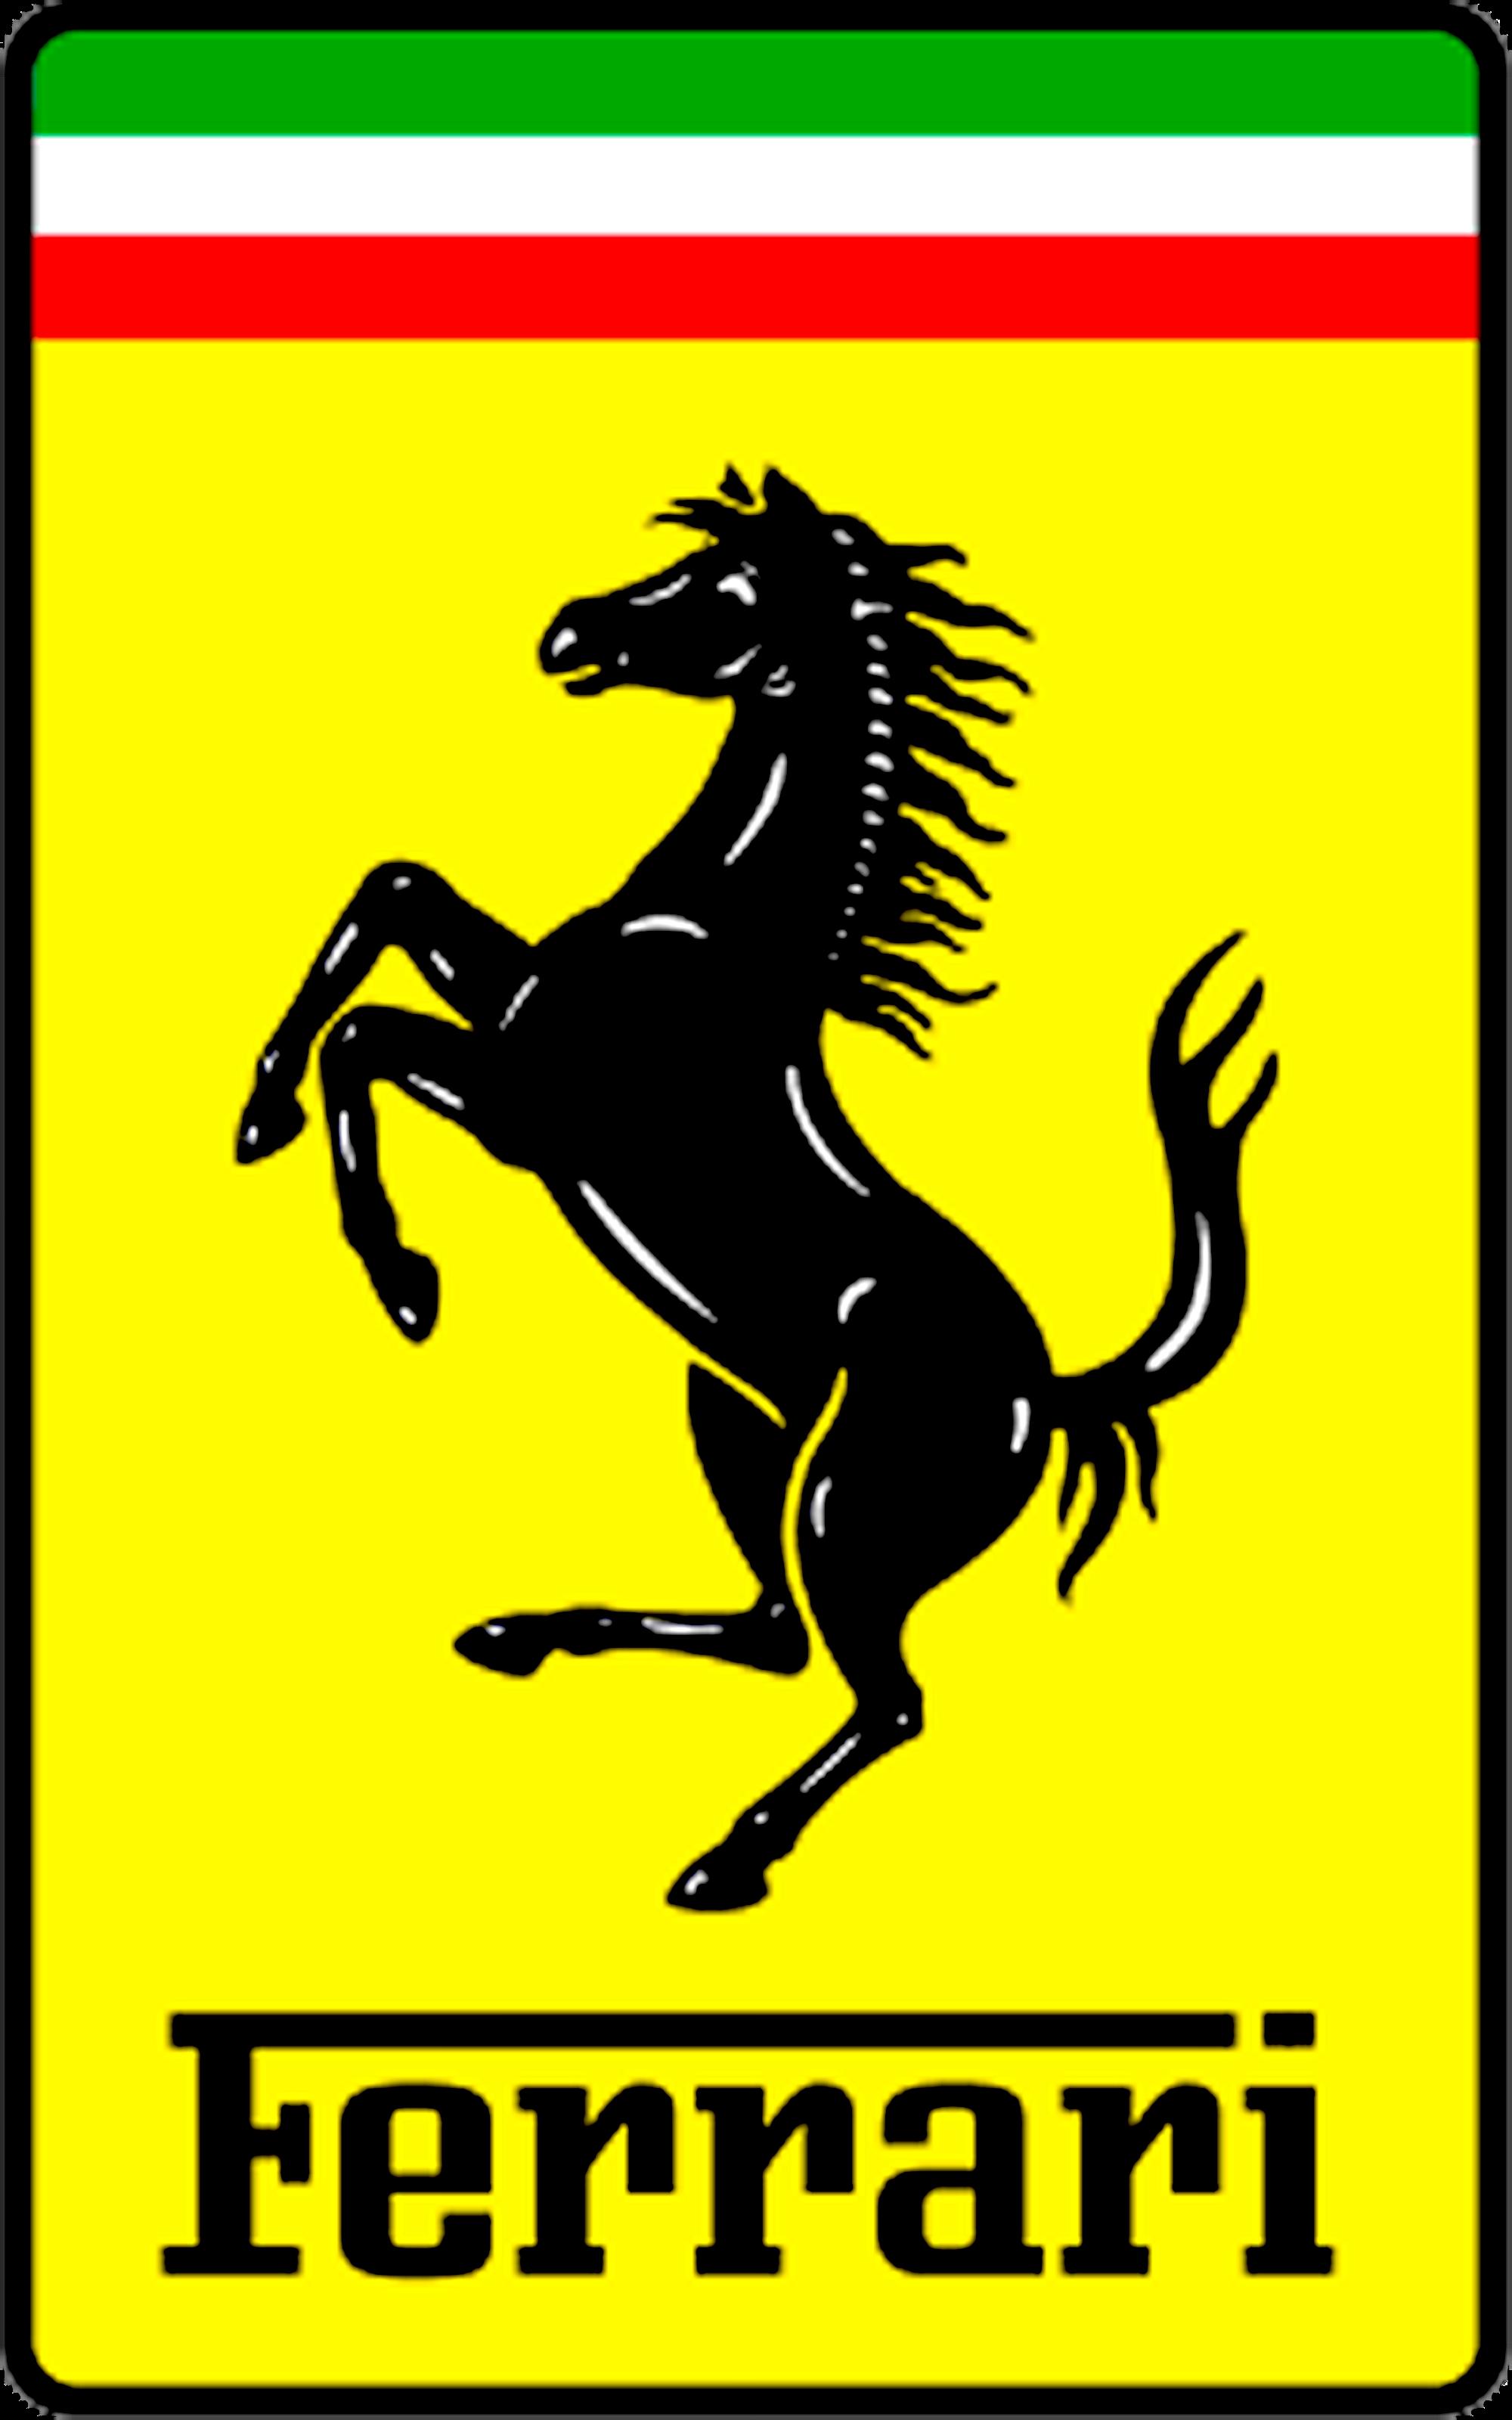 ferrari-logo-png-qq3sa6xc